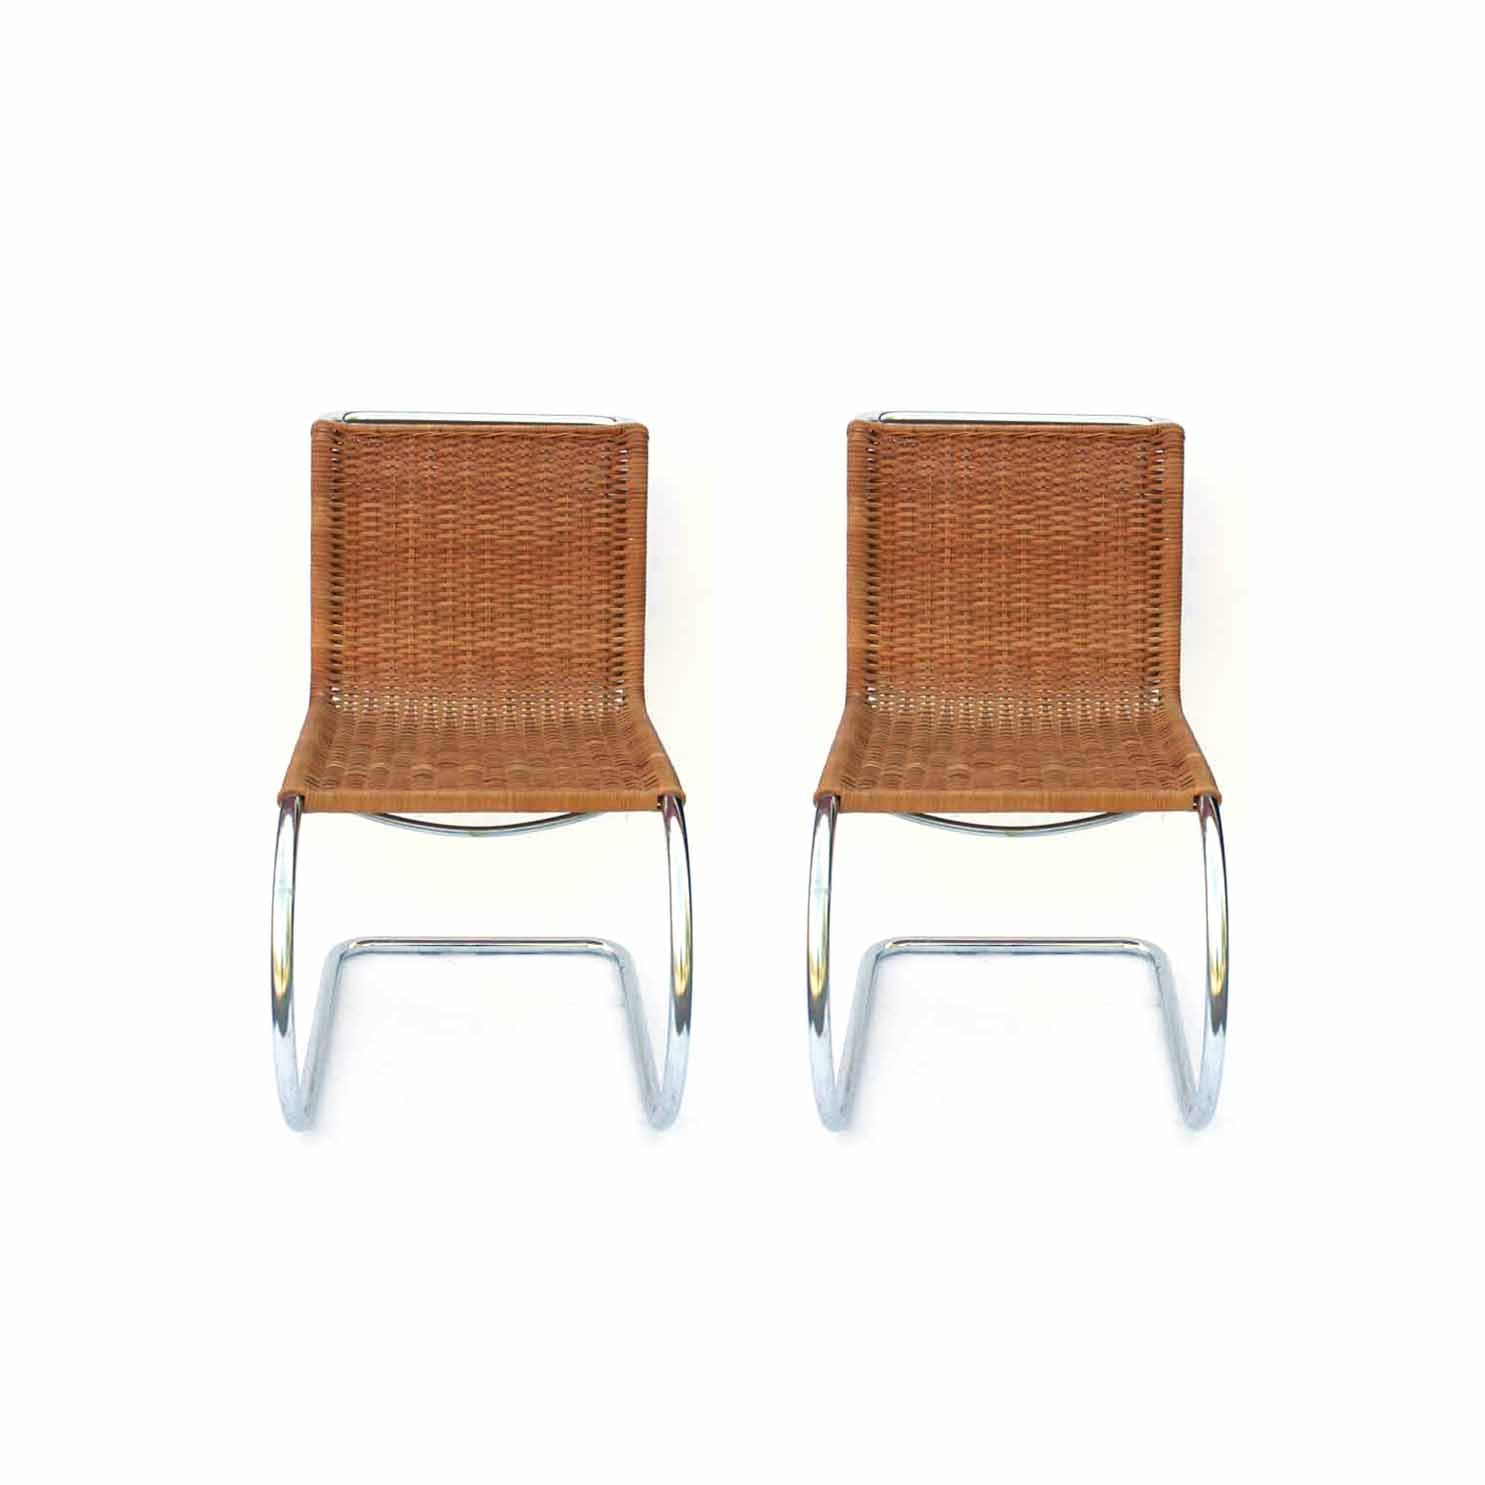 Two Tubular Rattan Chairs